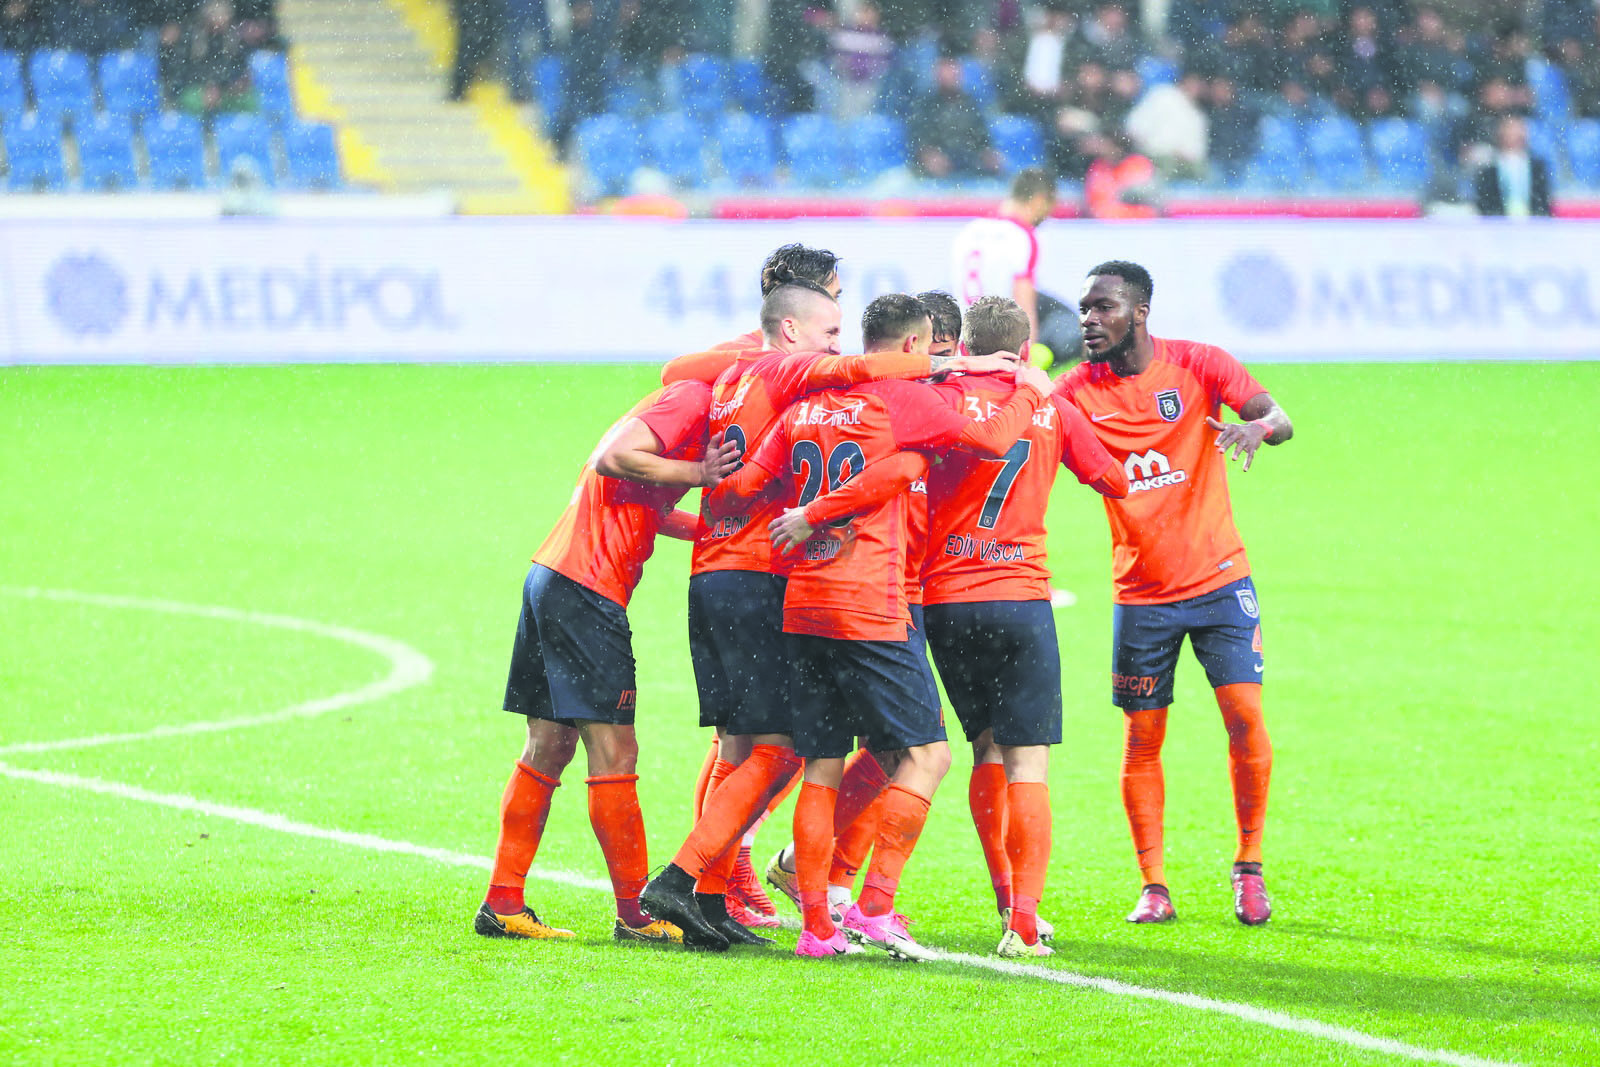 Bau015faku015fehir got the most remarkable win against Galatasaray, thrashing the Istanbul powerhouse 5-1 in week 12.